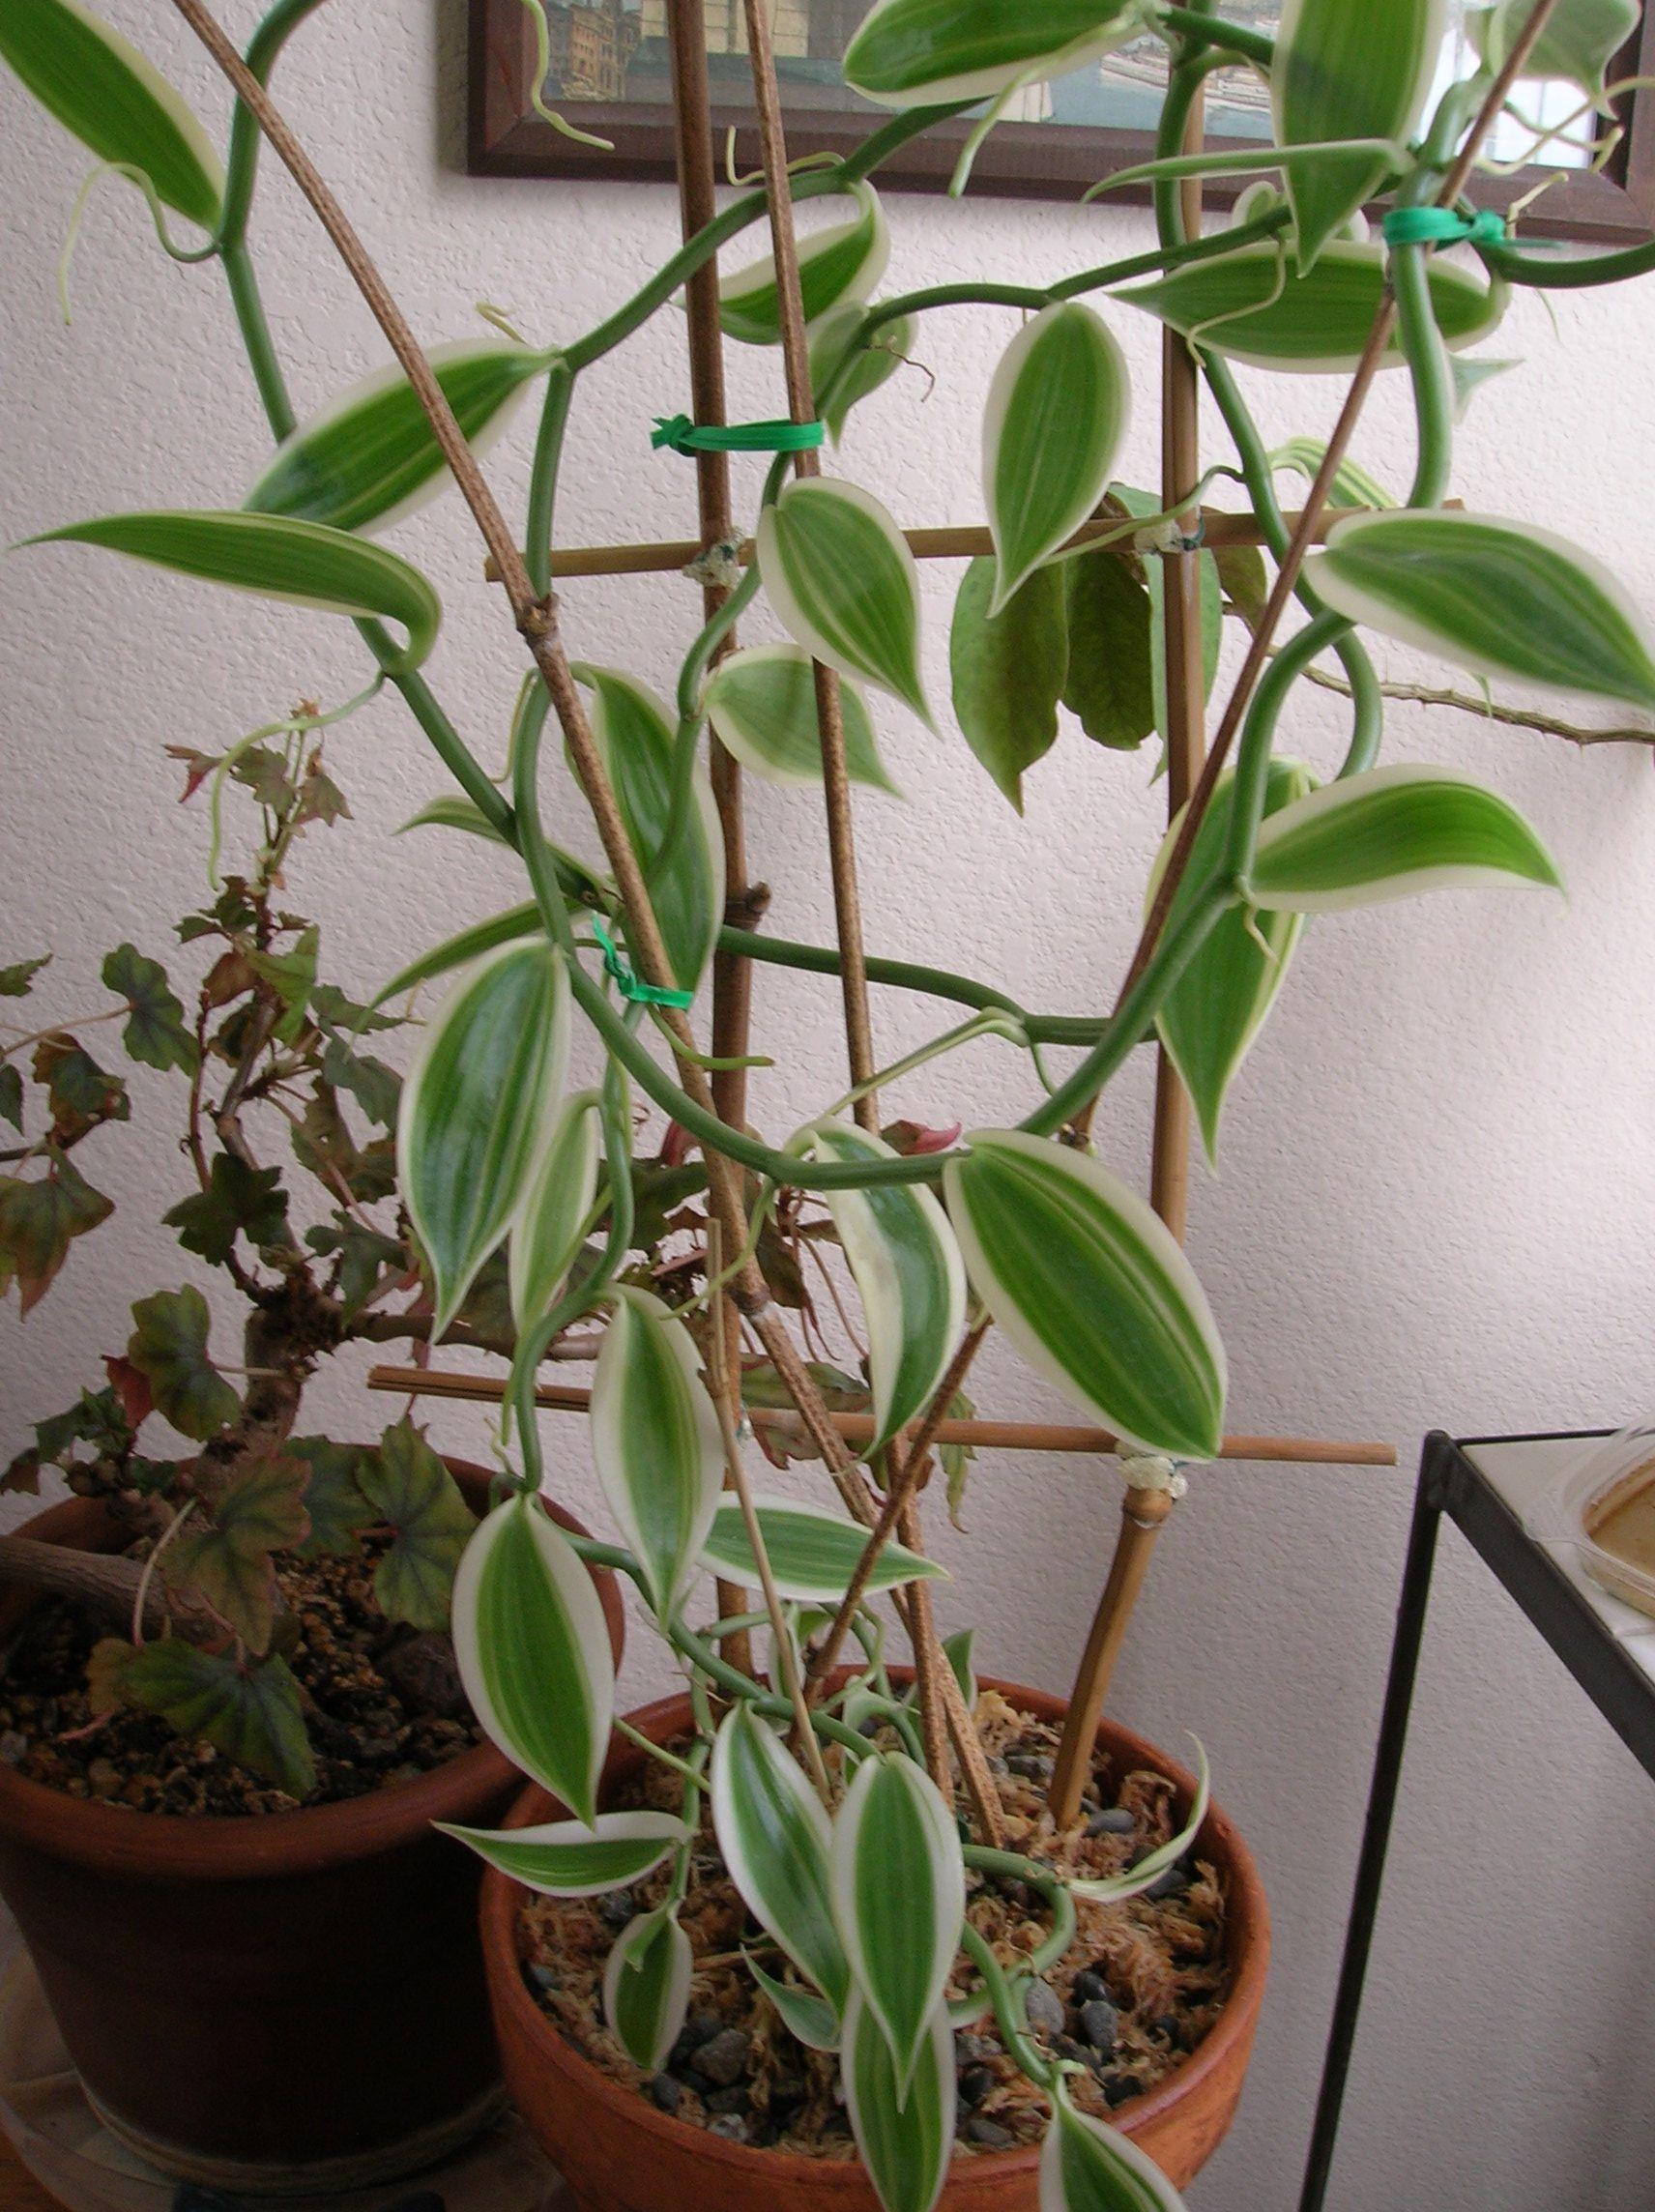 Vanilla Planifolia Variegata Baunilha Planta Orquidea